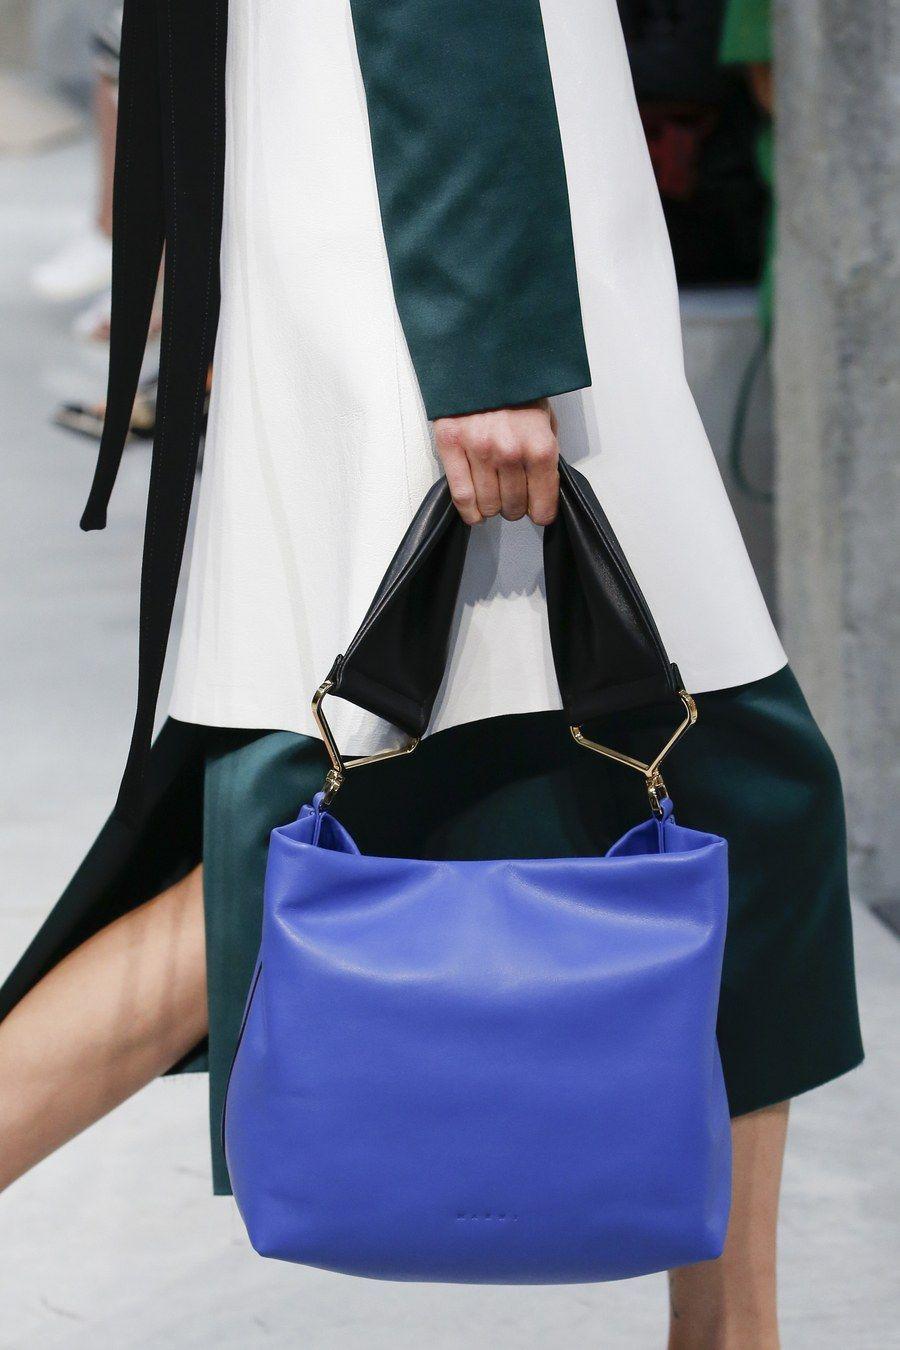 Marni Spring 2016 Ready-to-Wear Fashion Show in 2019 ...